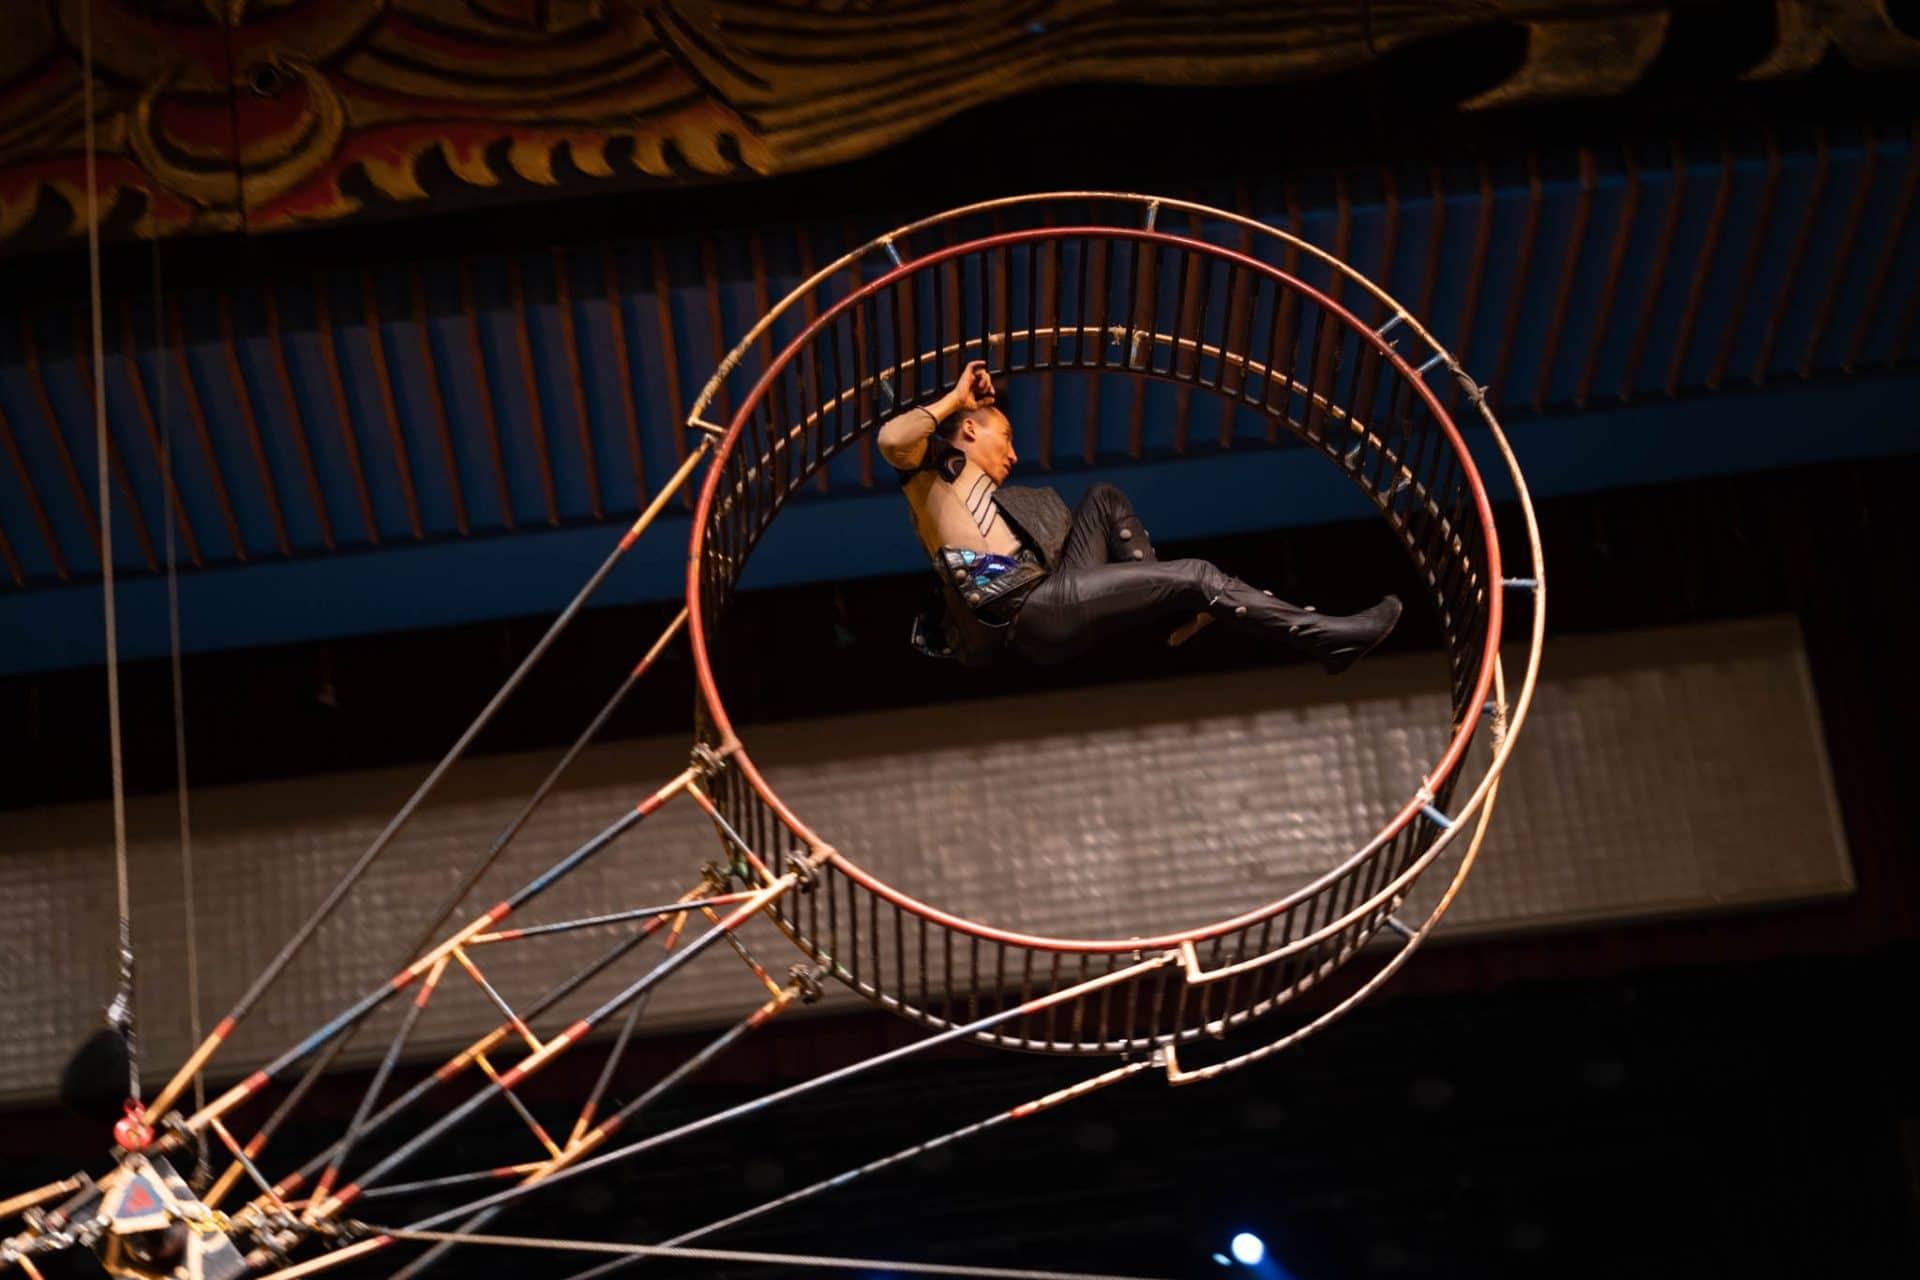 Beijing acrobatics show China